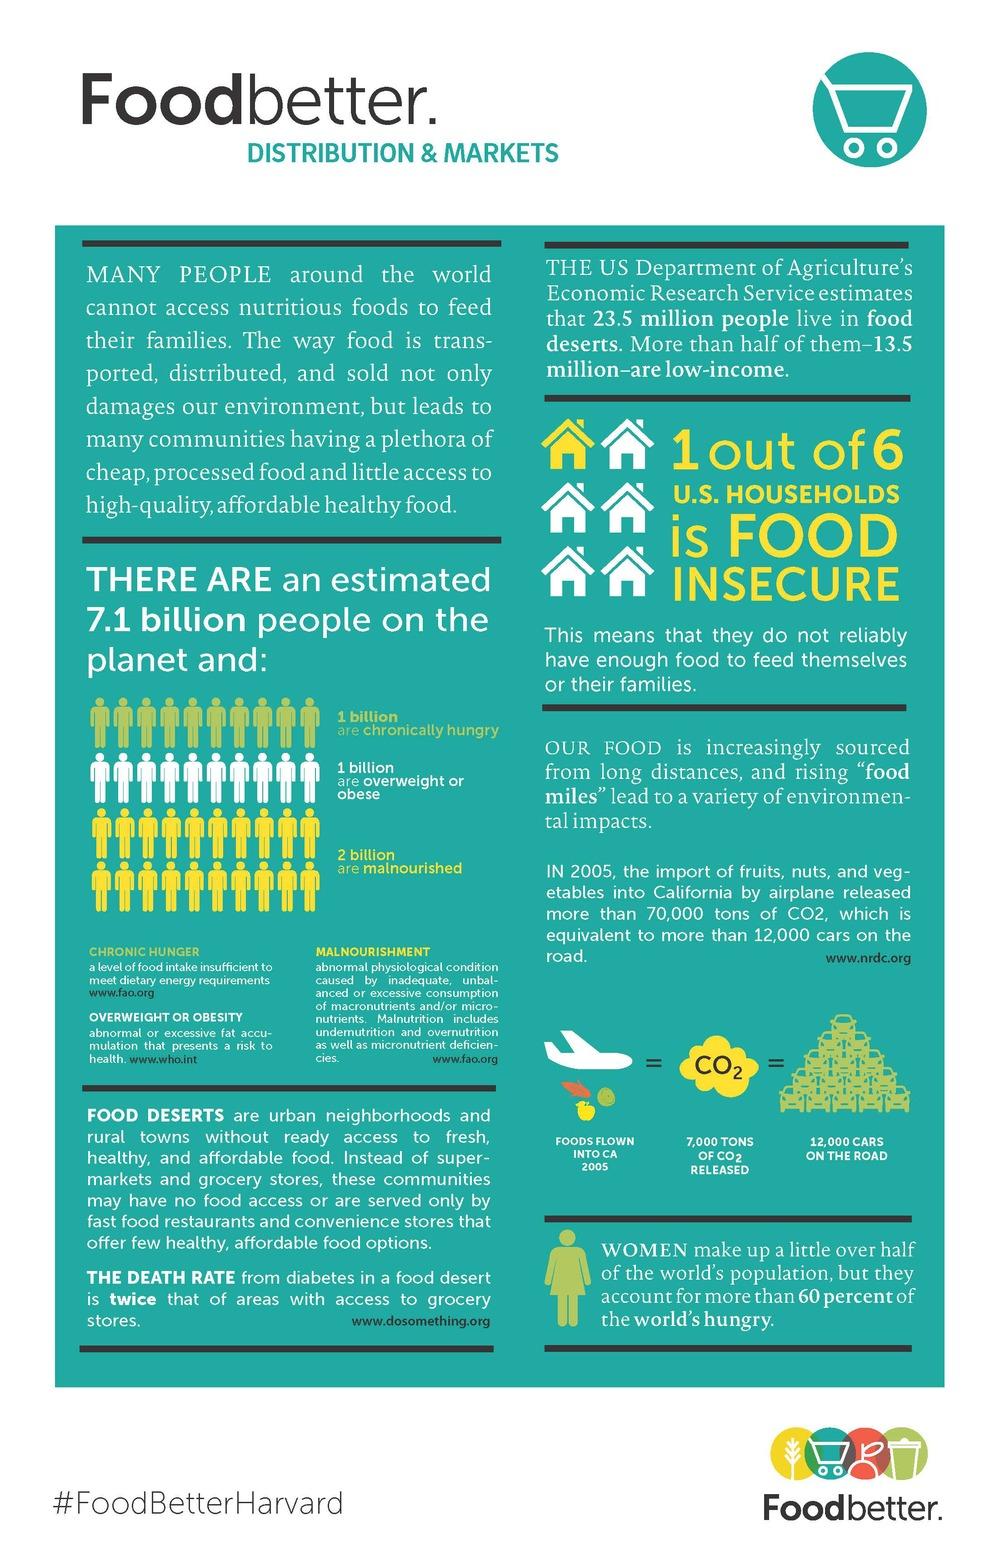 FB-infographic-DIST.jpg